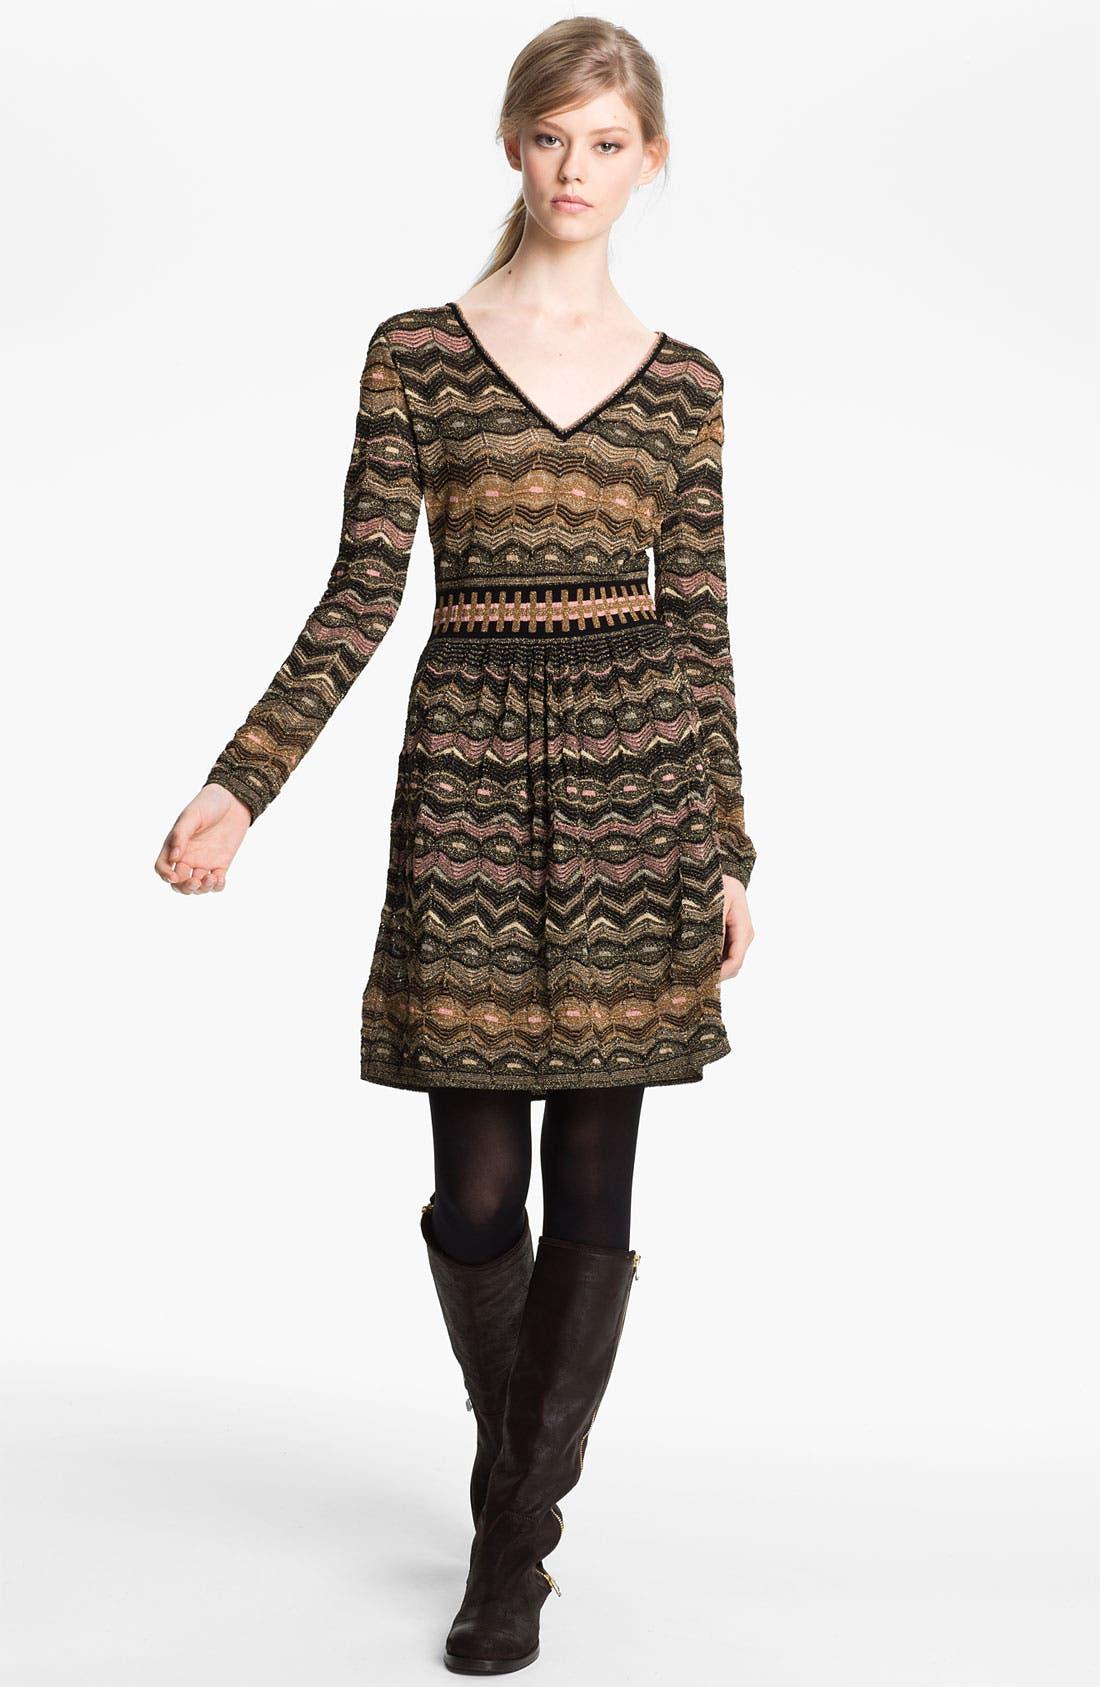 Alternate Image 1 Selected - M Missoni Zigzag Metallic Knit Dress